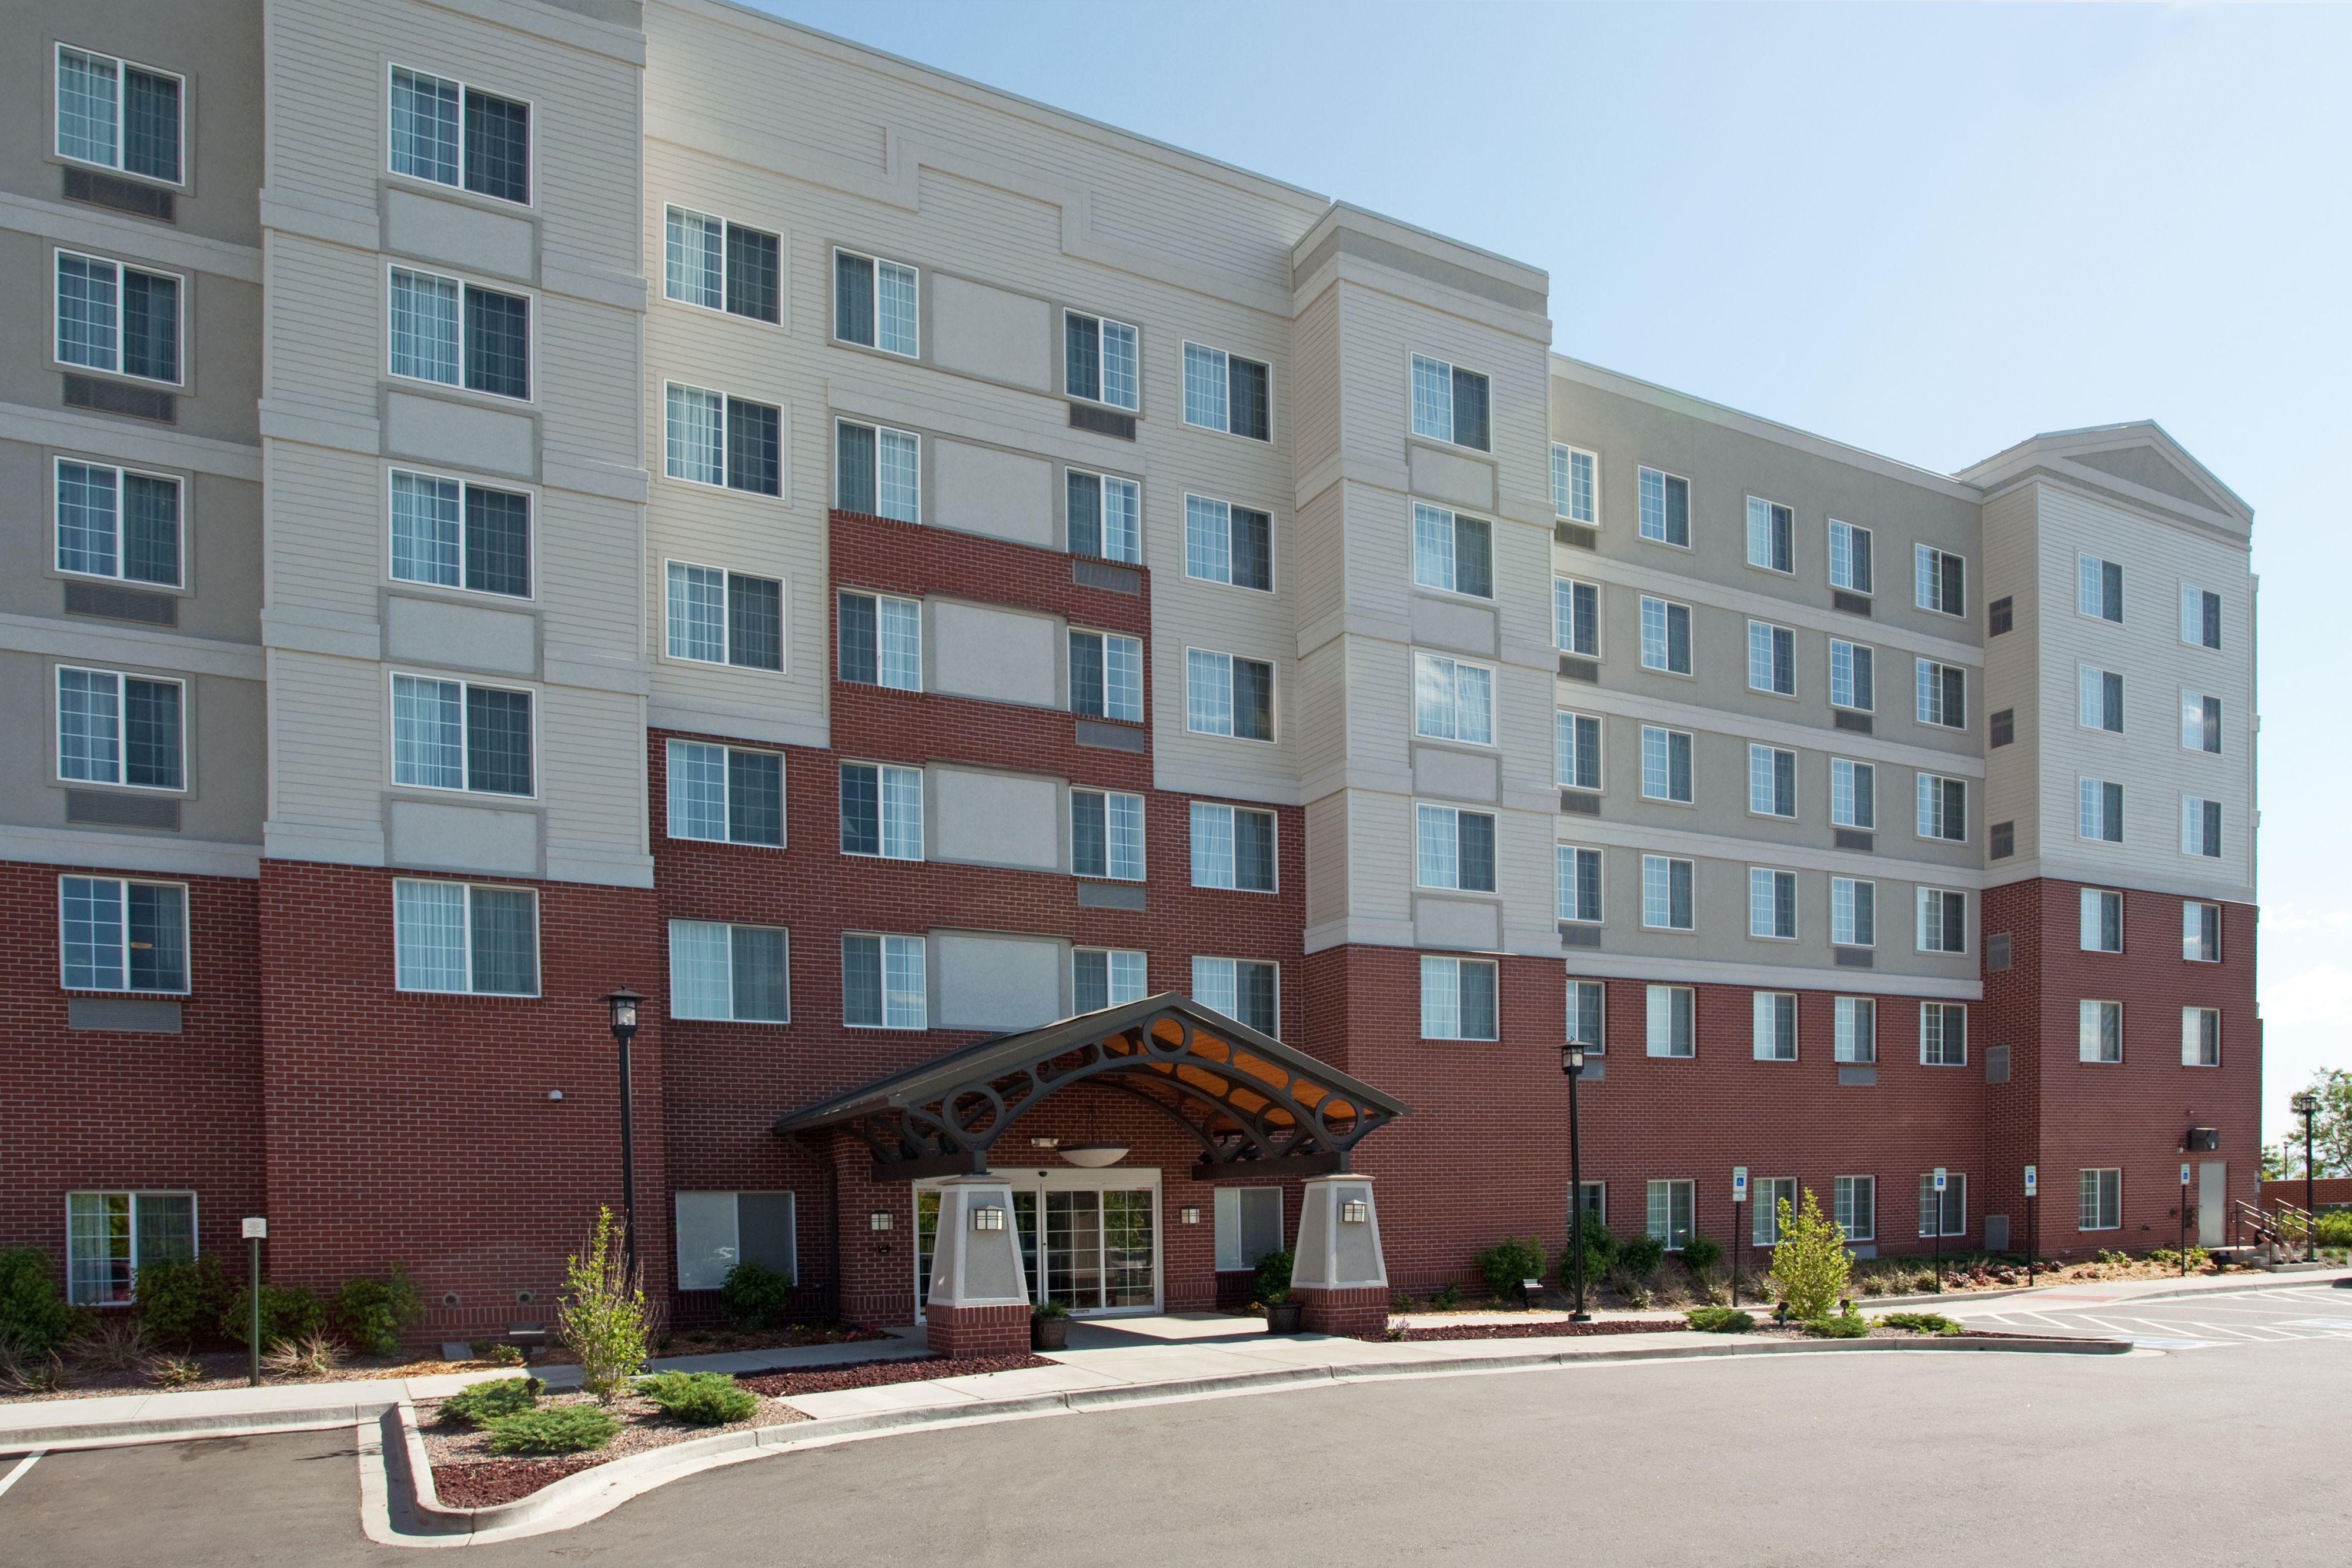 staybridge-suites-denver-2532893789-original.jpg